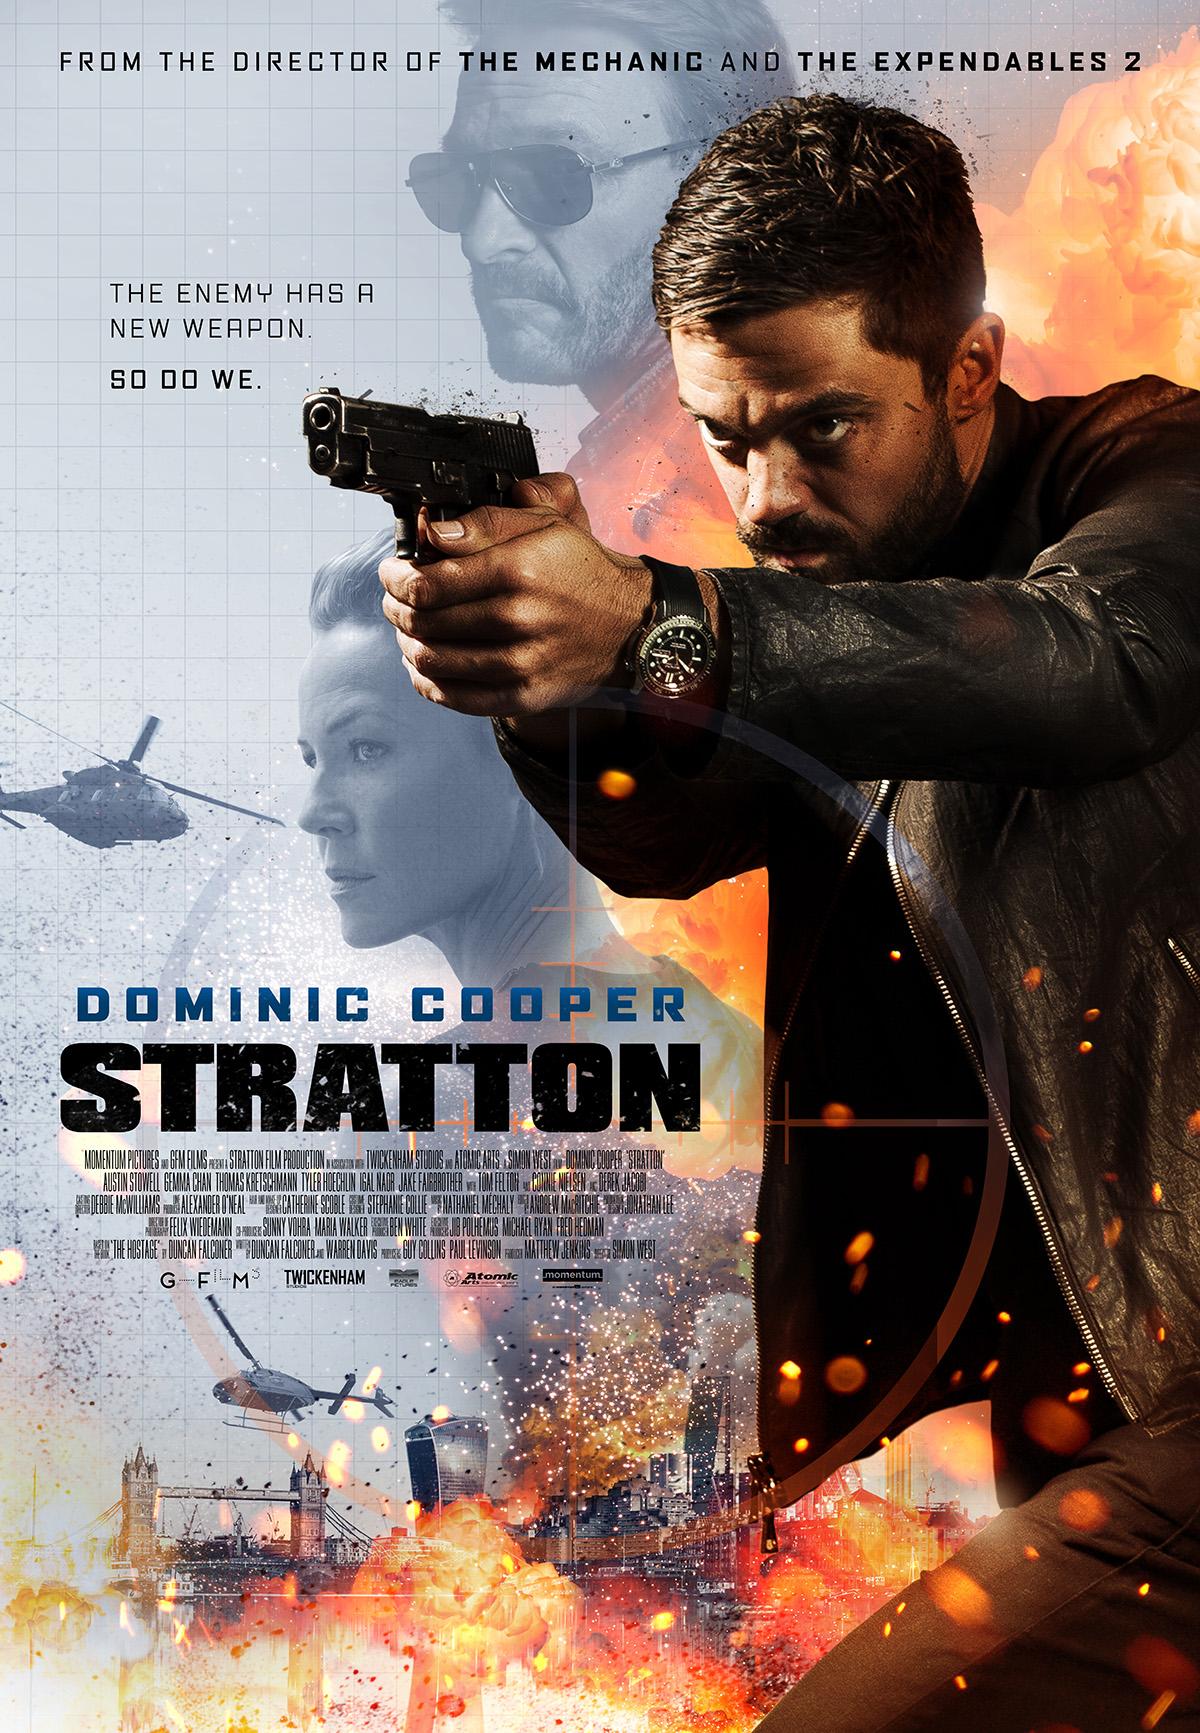 Stratton: Forças Especiais [Dub] – IMDB 4.8